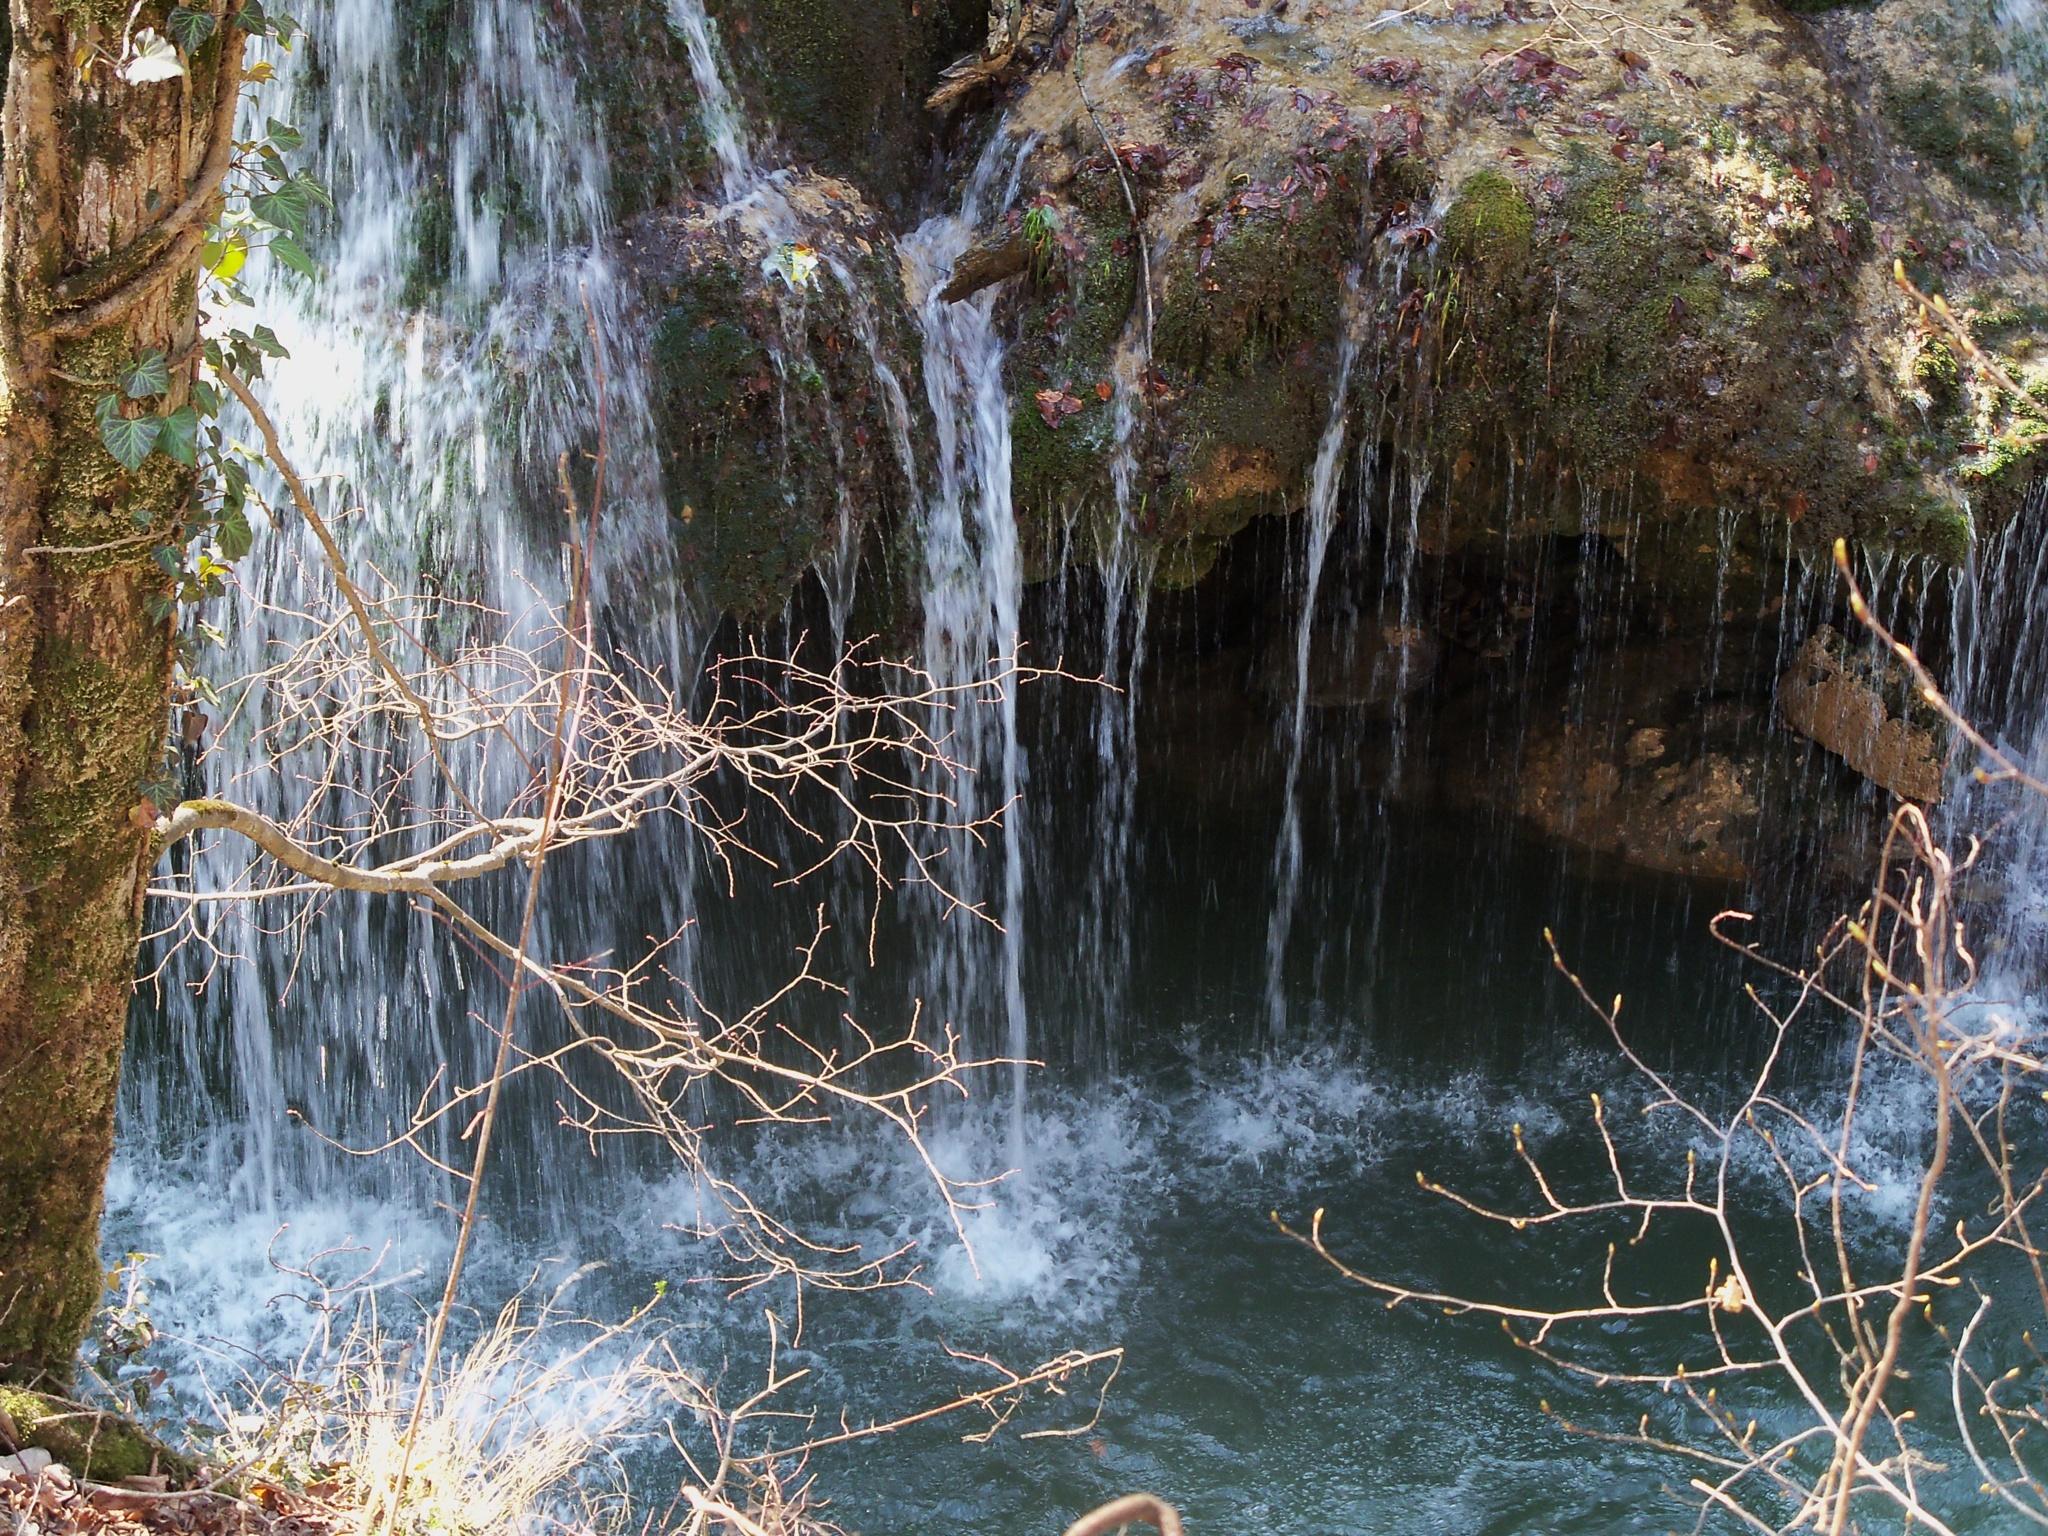 waterfall - Bigar by Ionela Garovat